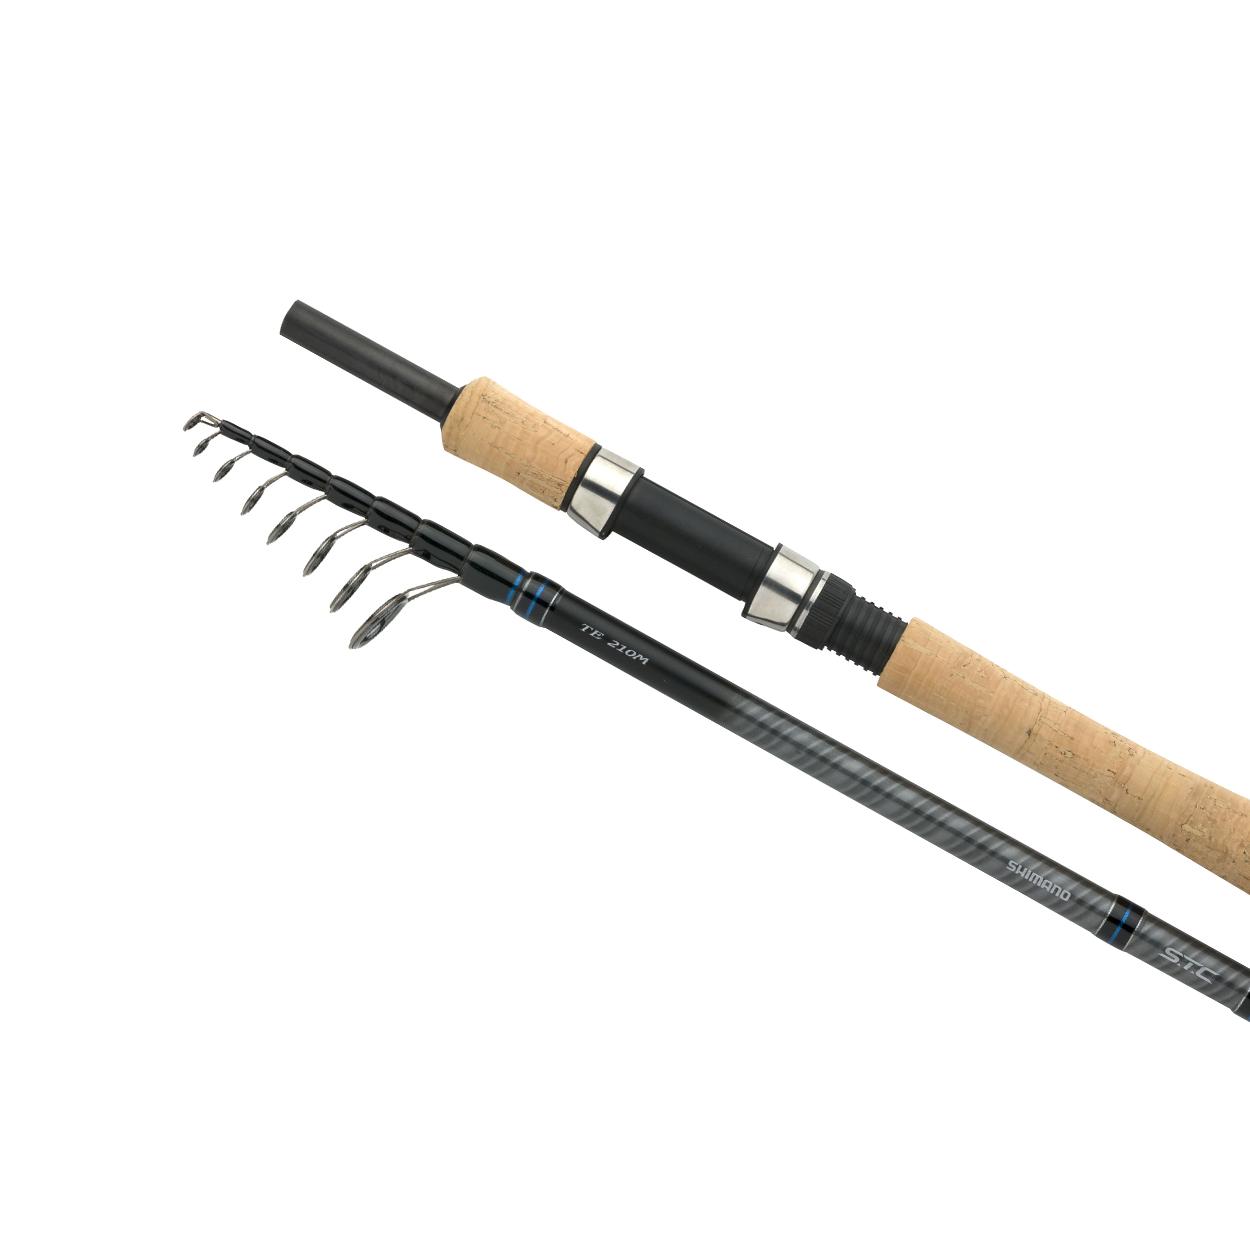 Удилище спиннинговое SHIMANO STC MINI TELE 270ML (+ Леска в подарок!) удилище спиннинговое shimano stc mini tele 240l леска в подарок